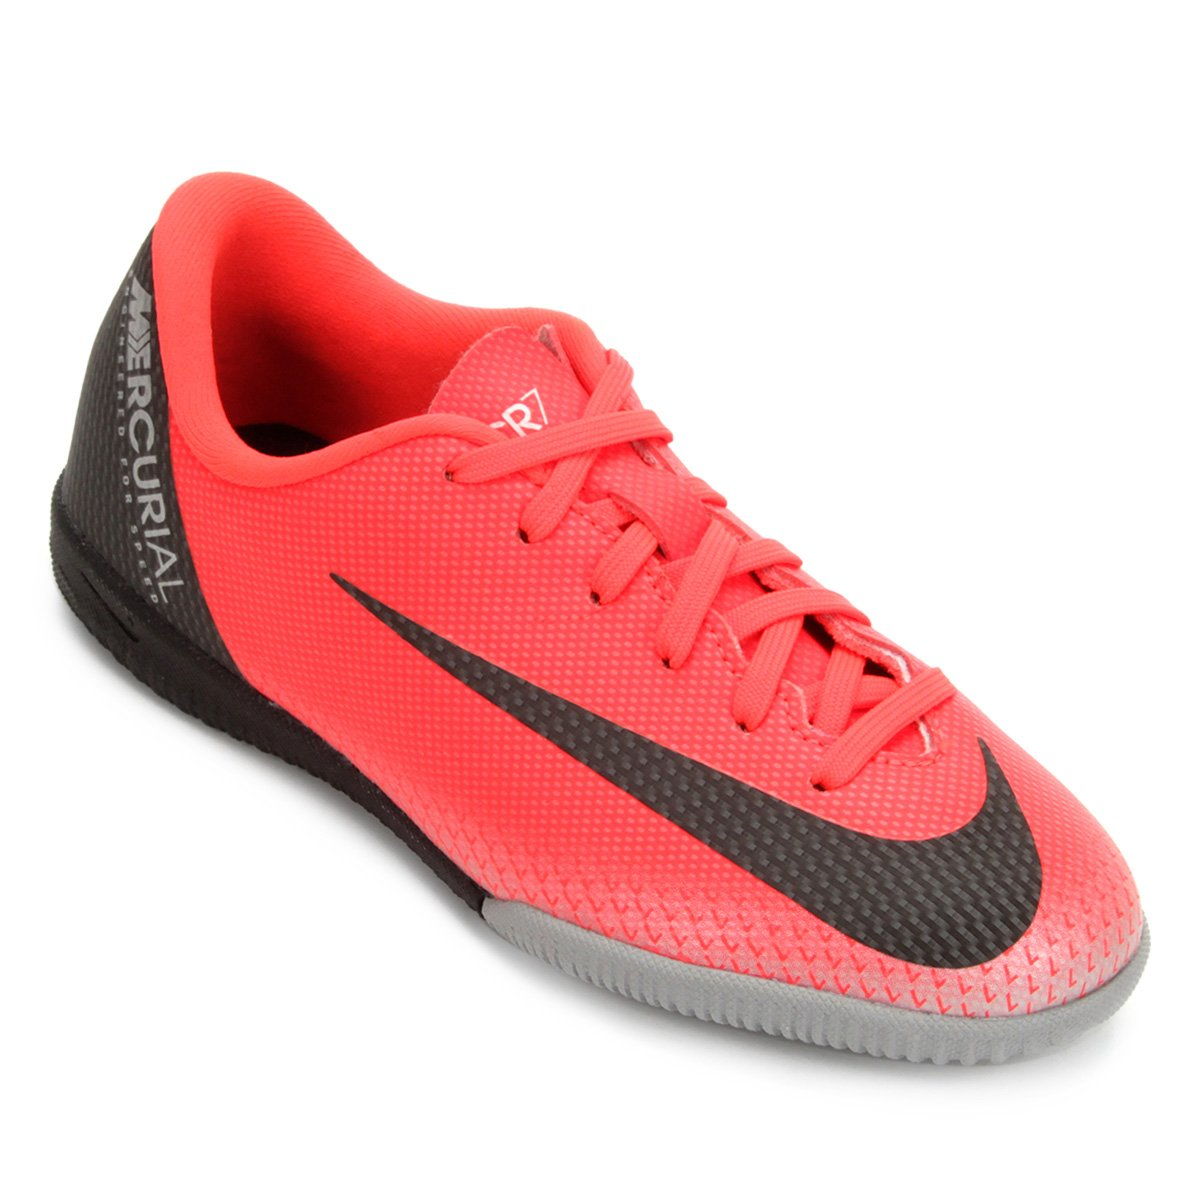 fc995e7a76 Chuteira Futsal Infantil Nike Mercurial Vapor 12 Academy GS CR7 IC